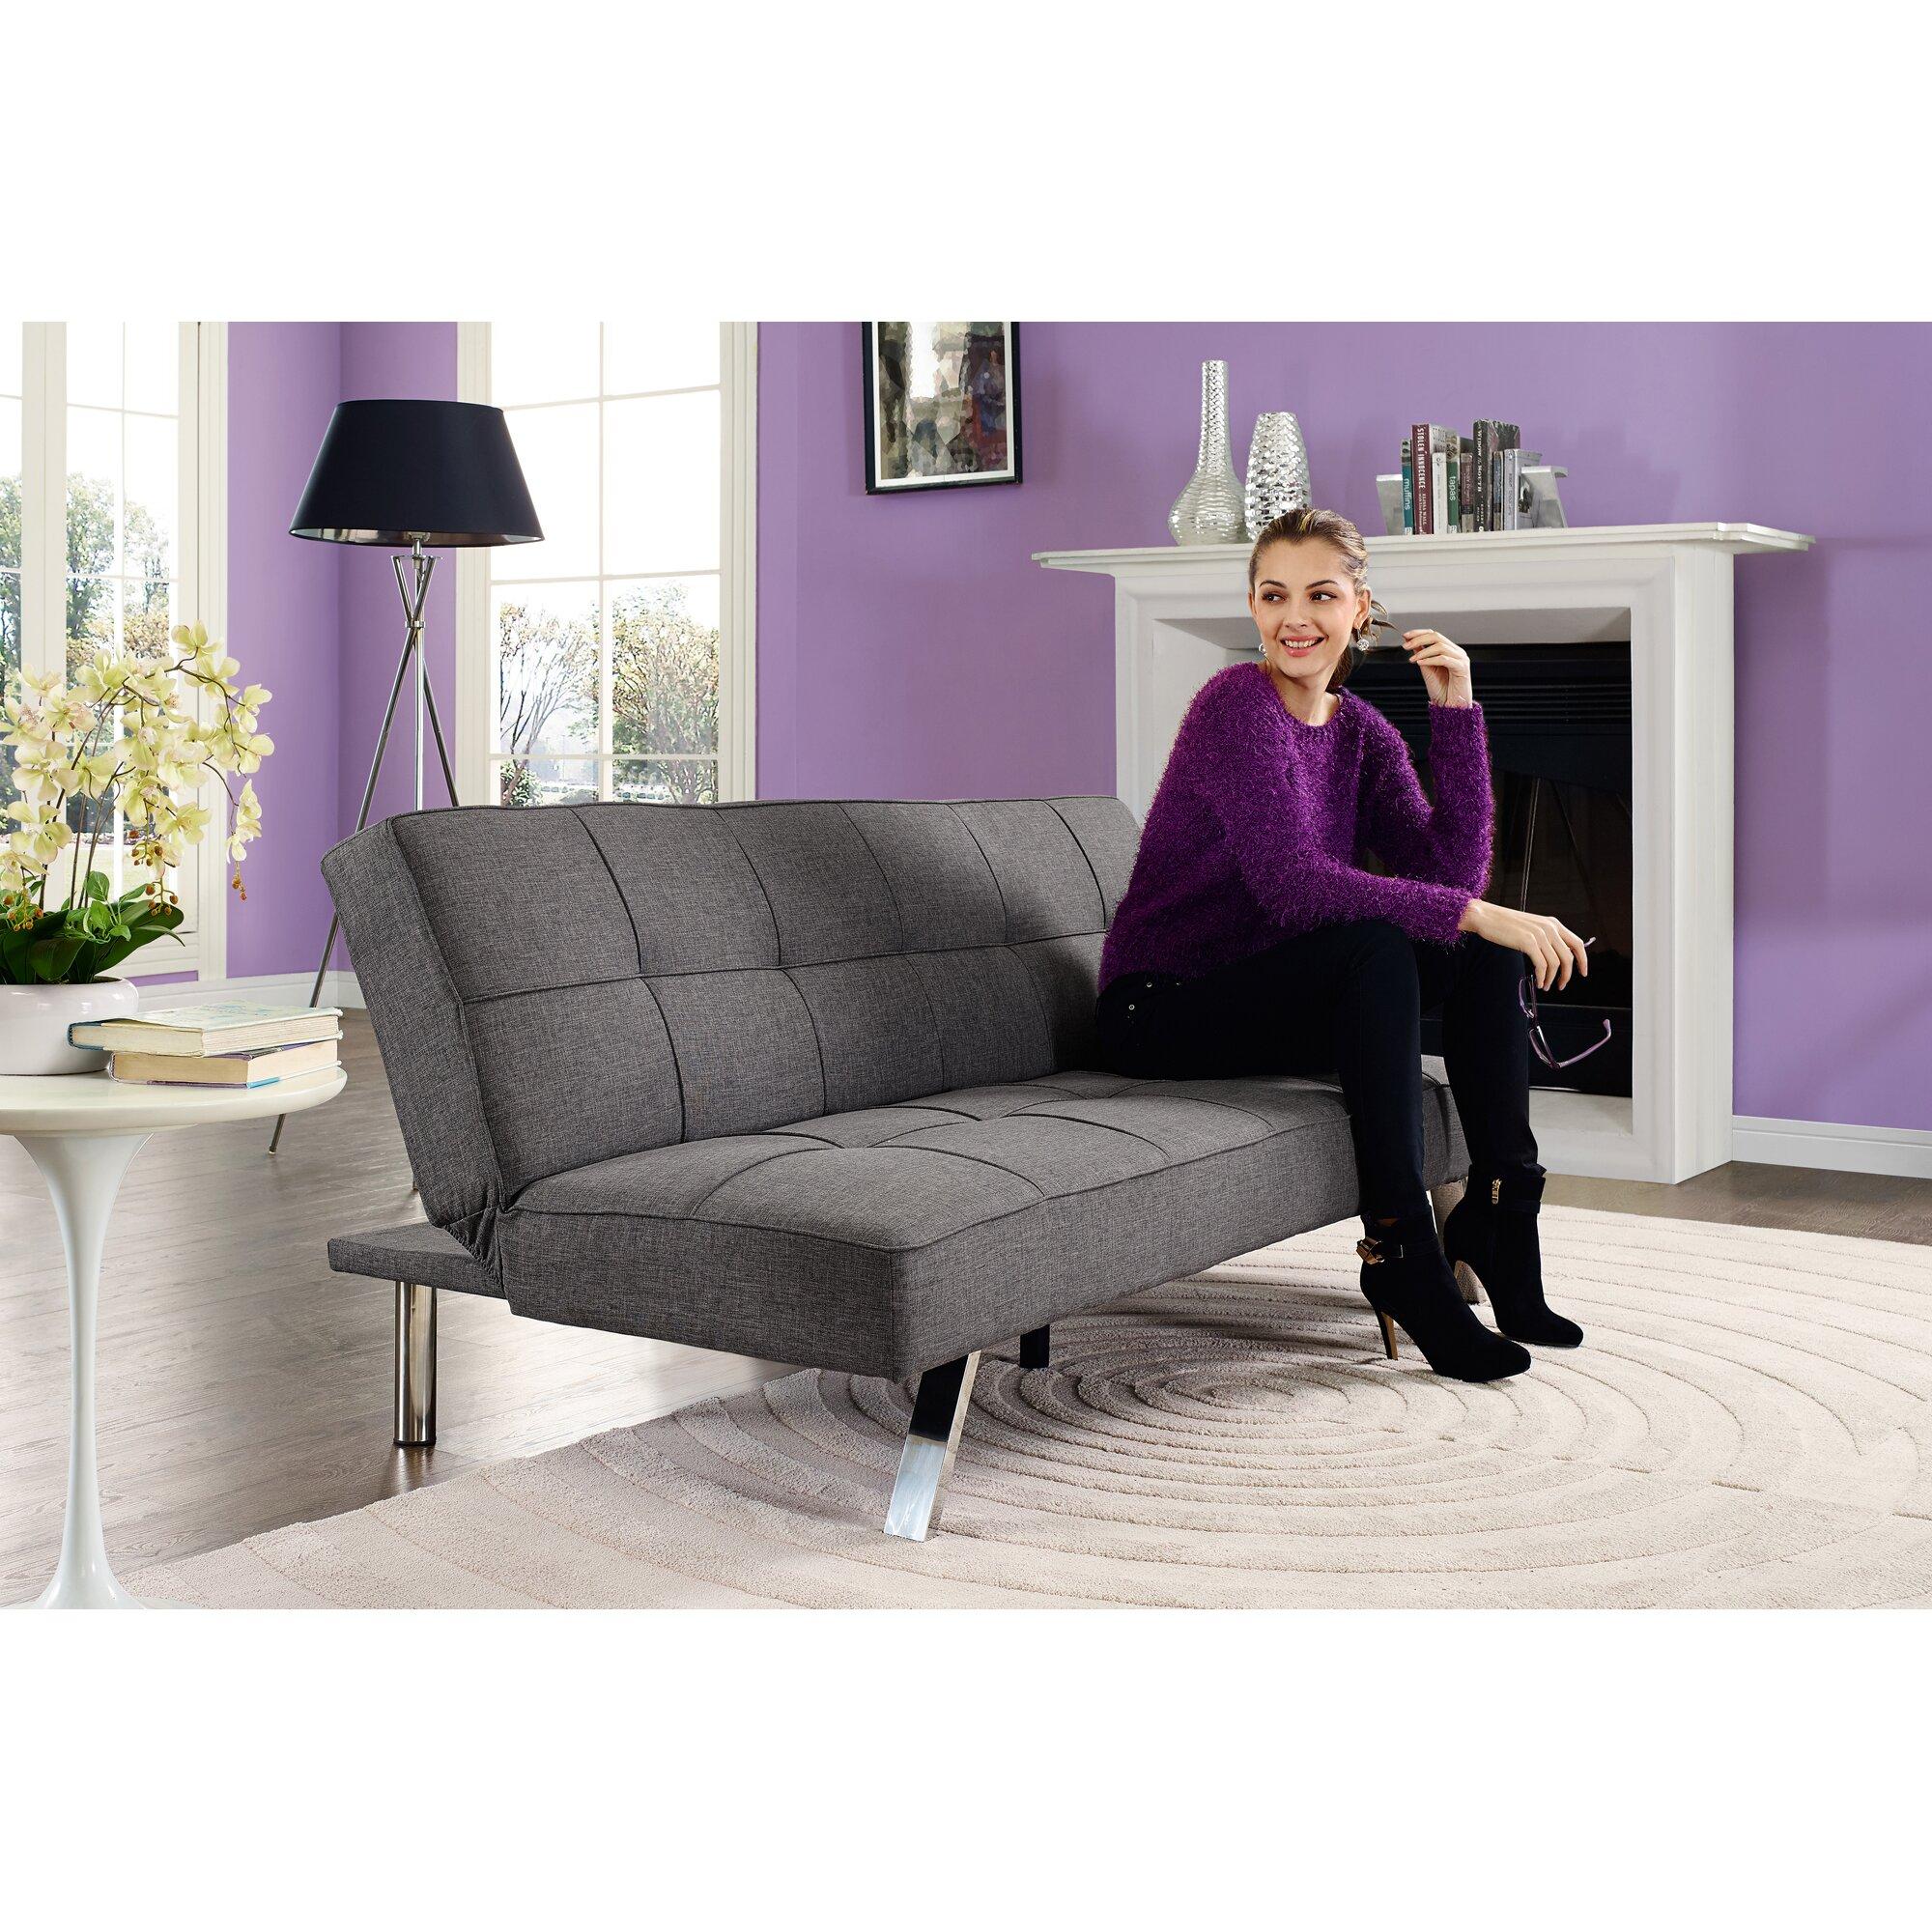 Dhp Zoe Convertible Sofa Amp Reviews Wayfair Ca